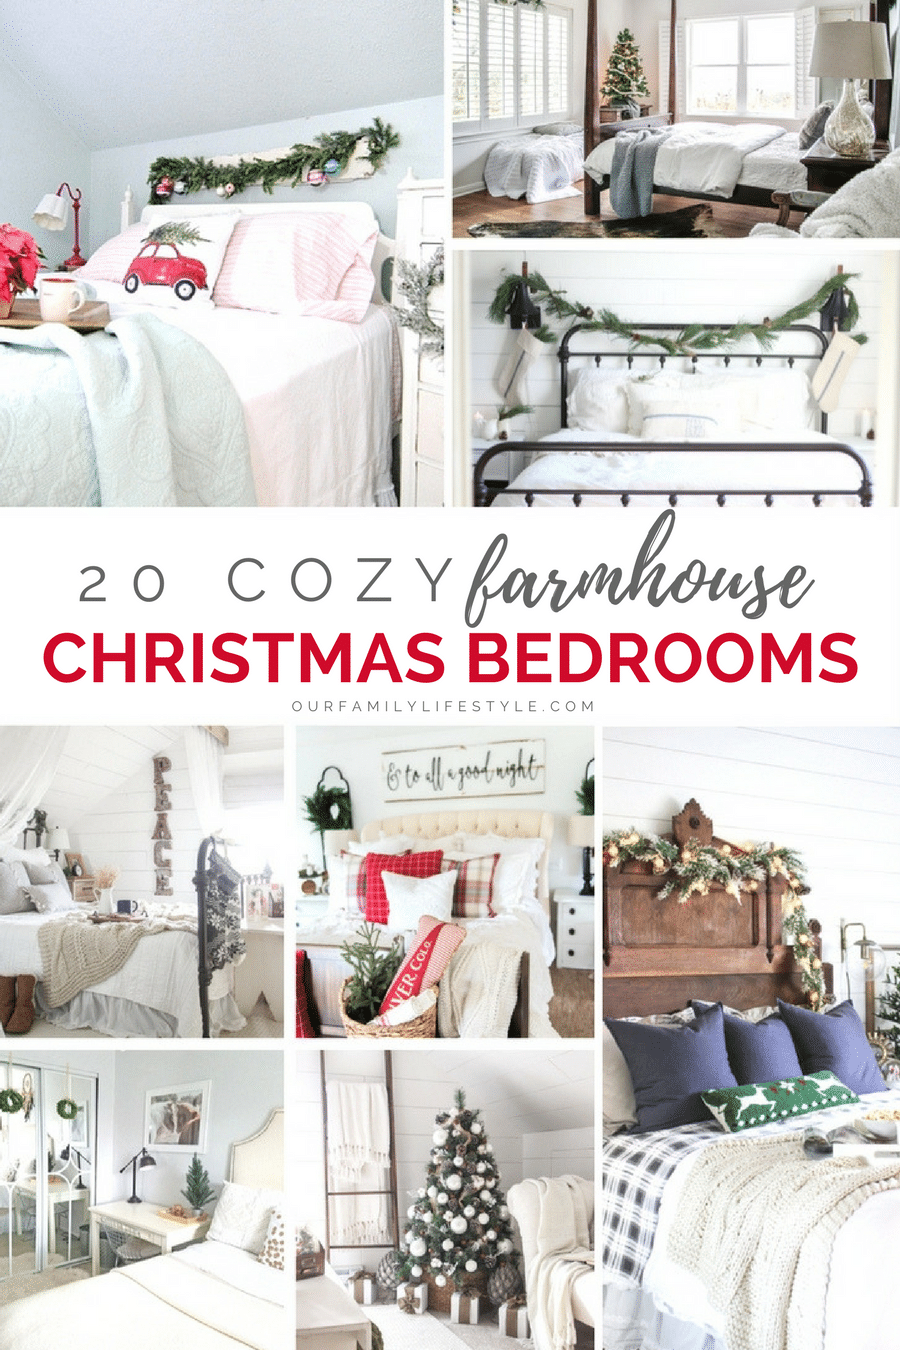 20 Cozy Farmhouse Christmas Bedrooms